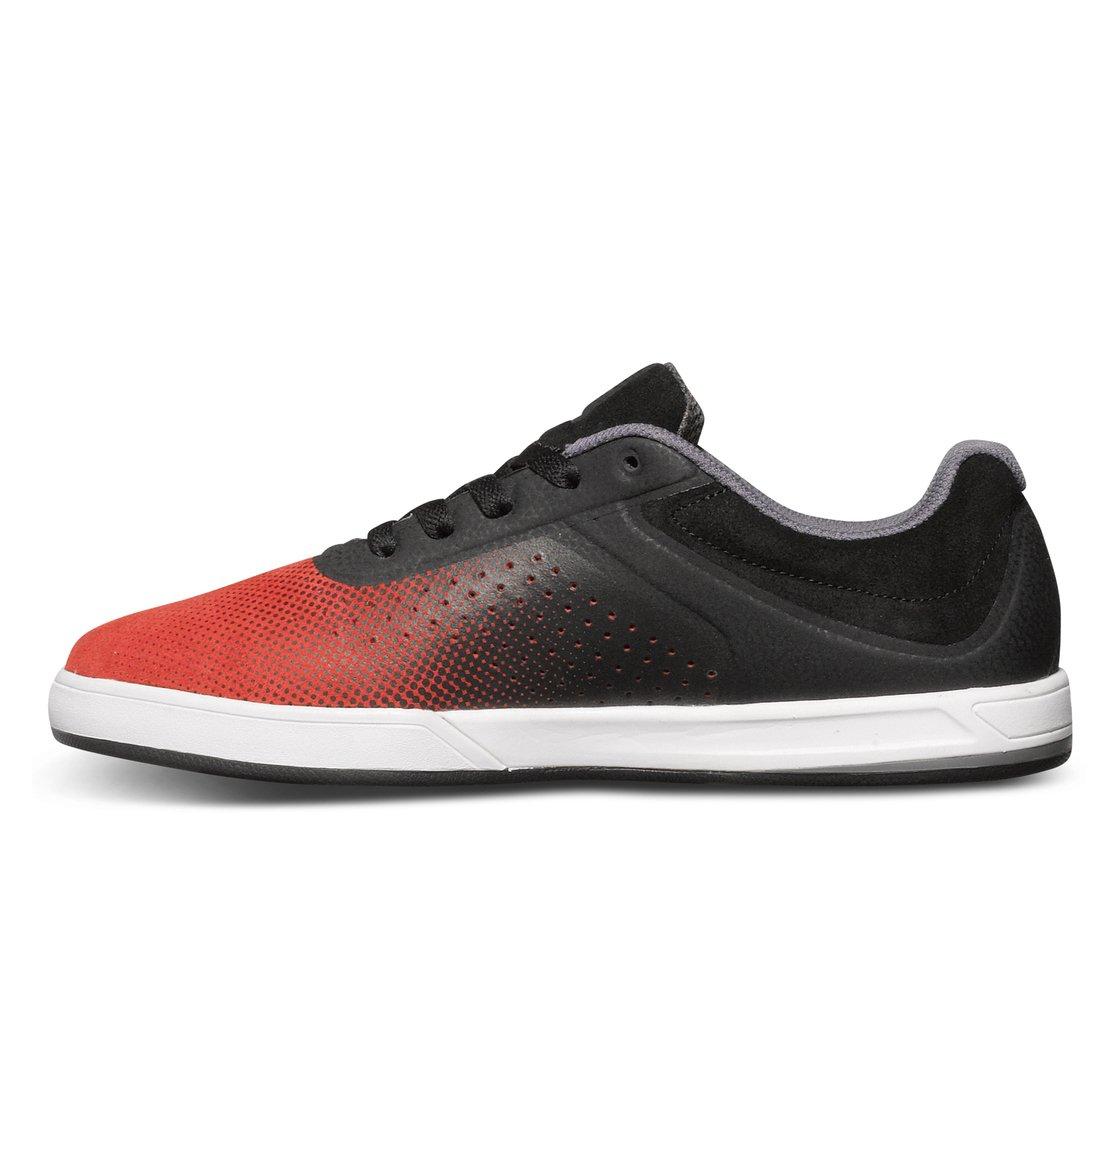 Skate shoes jakarta - 2 Men S Mike Mo Capaldi S Shoes 320175 Dc Shoes